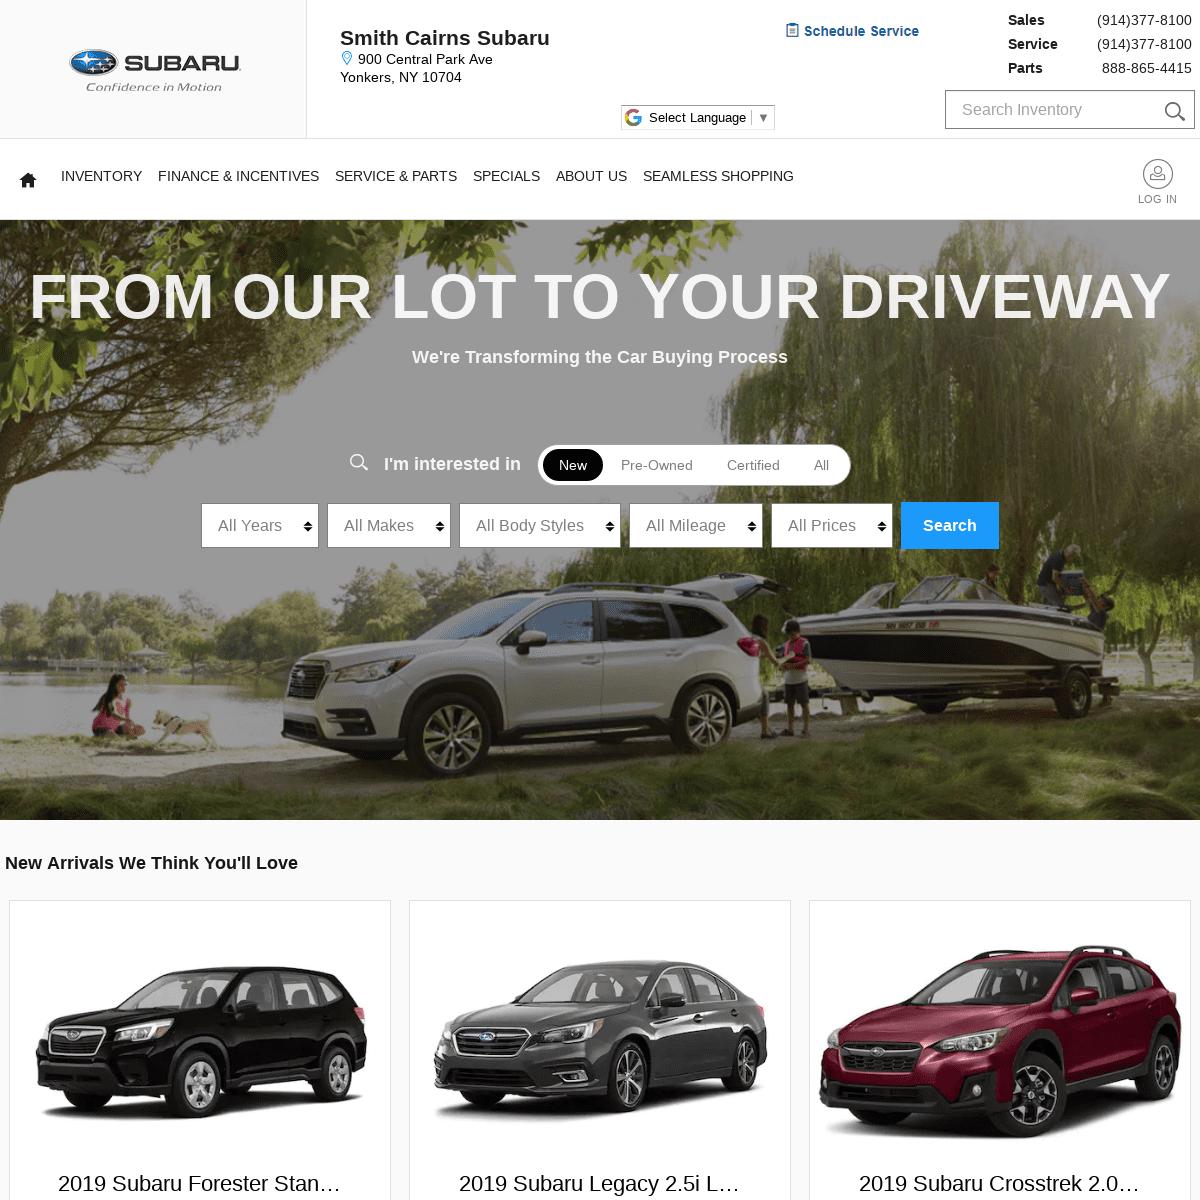 Subaru Dealership in New York - Yonkers - New Rochelle